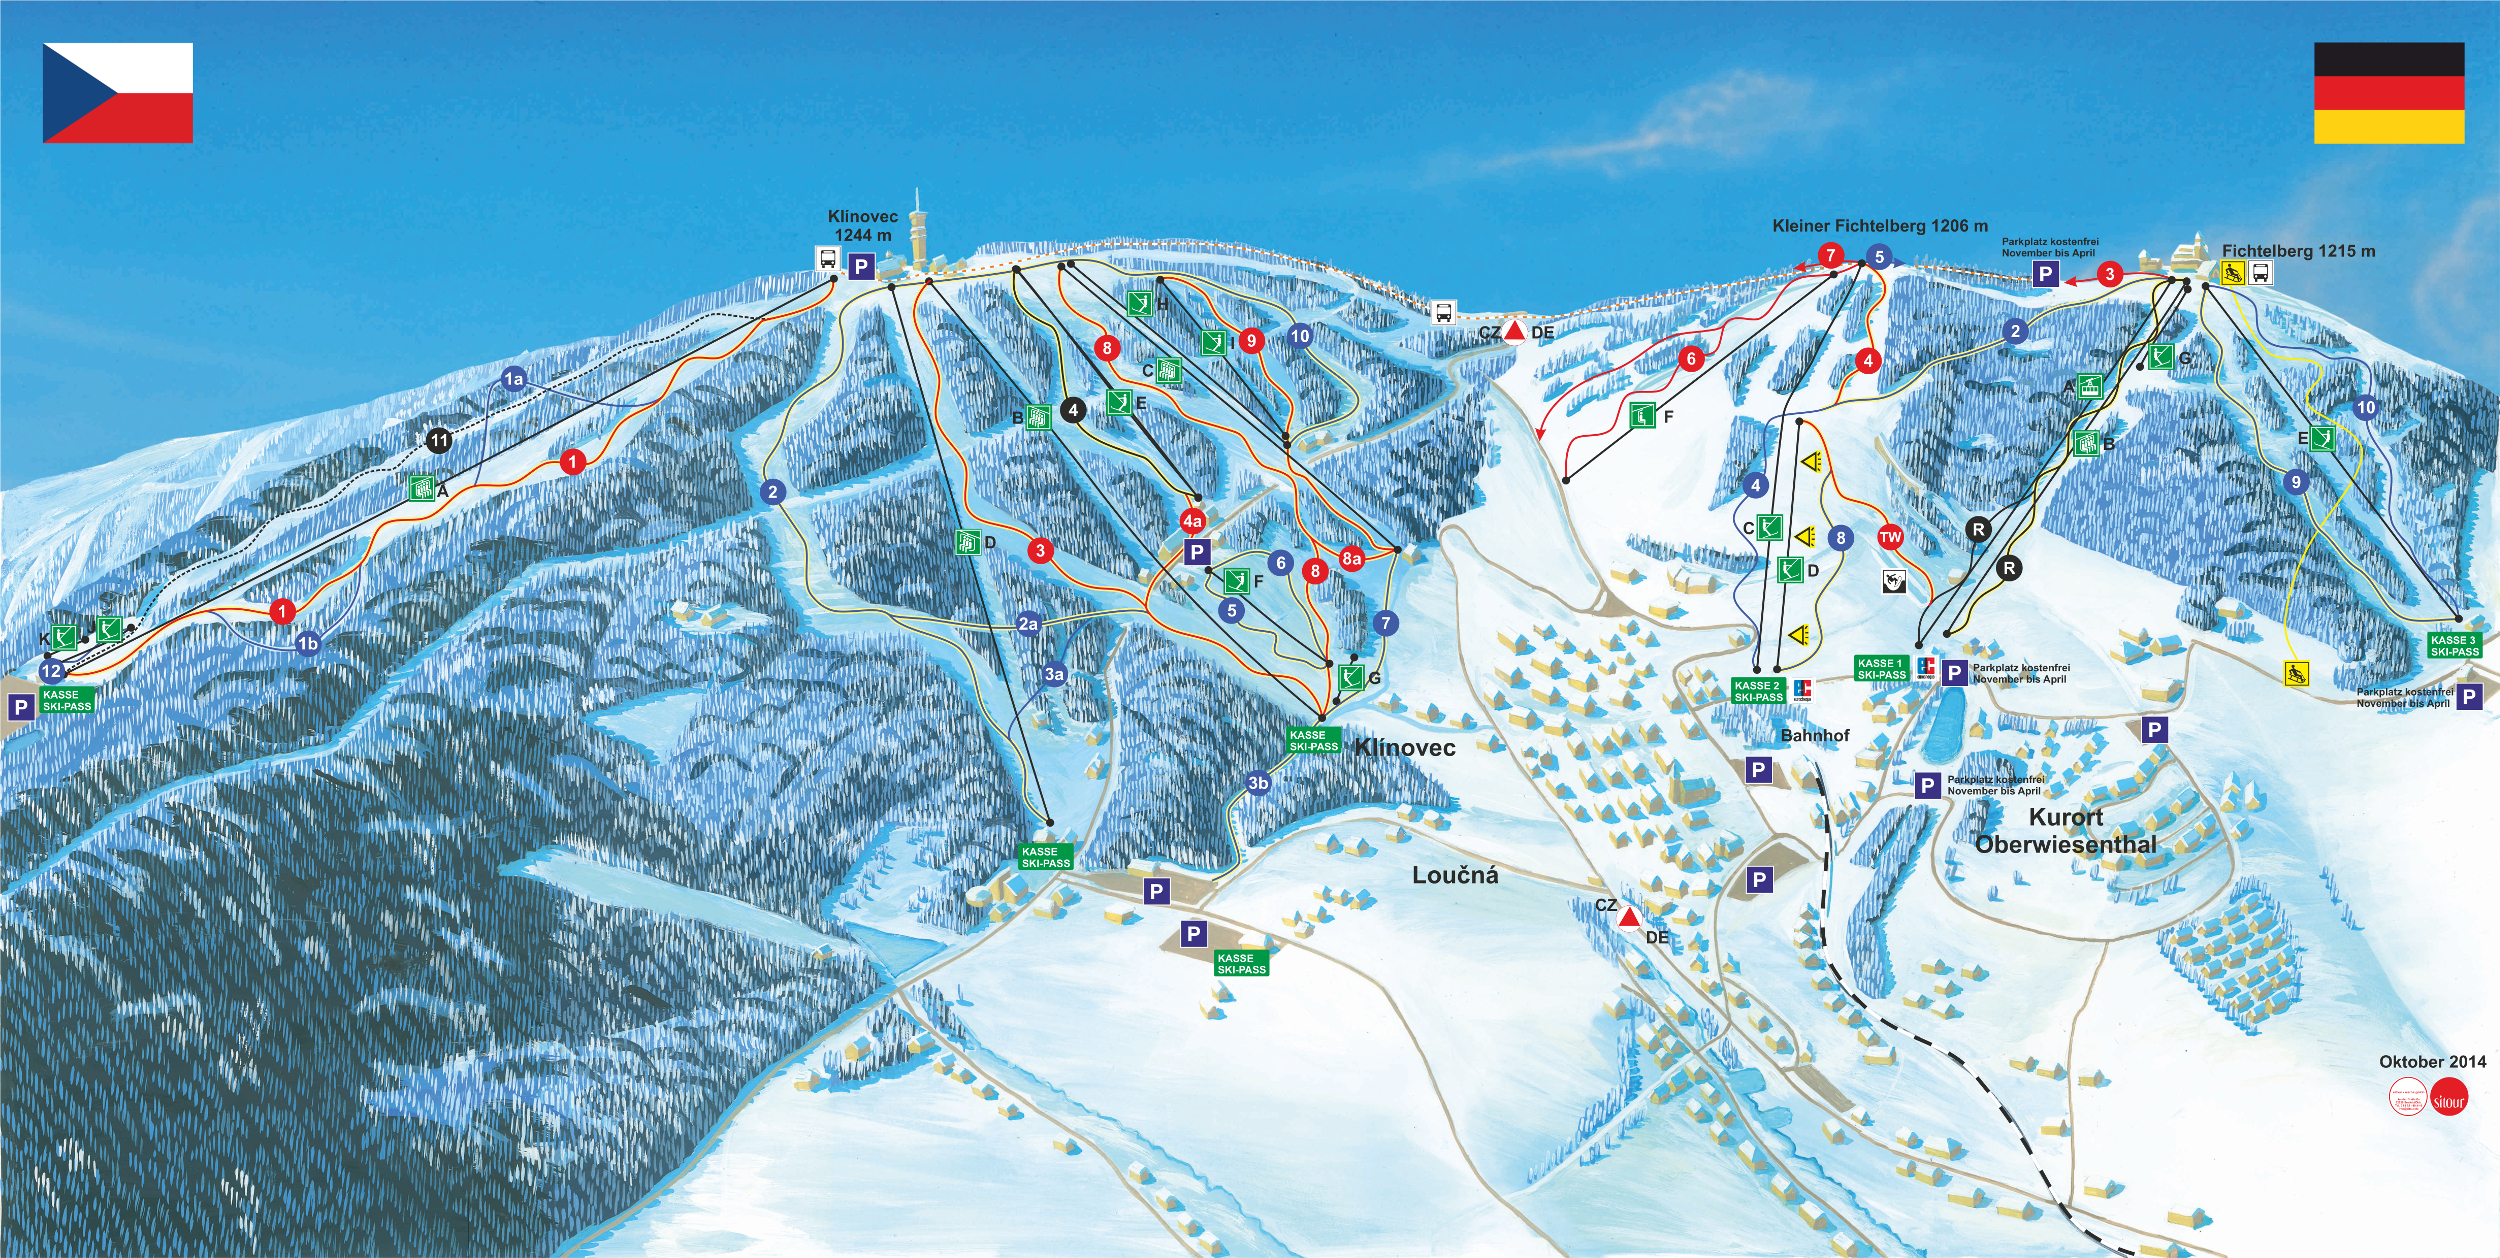 Oberwiesenthal Piste / Trail Map